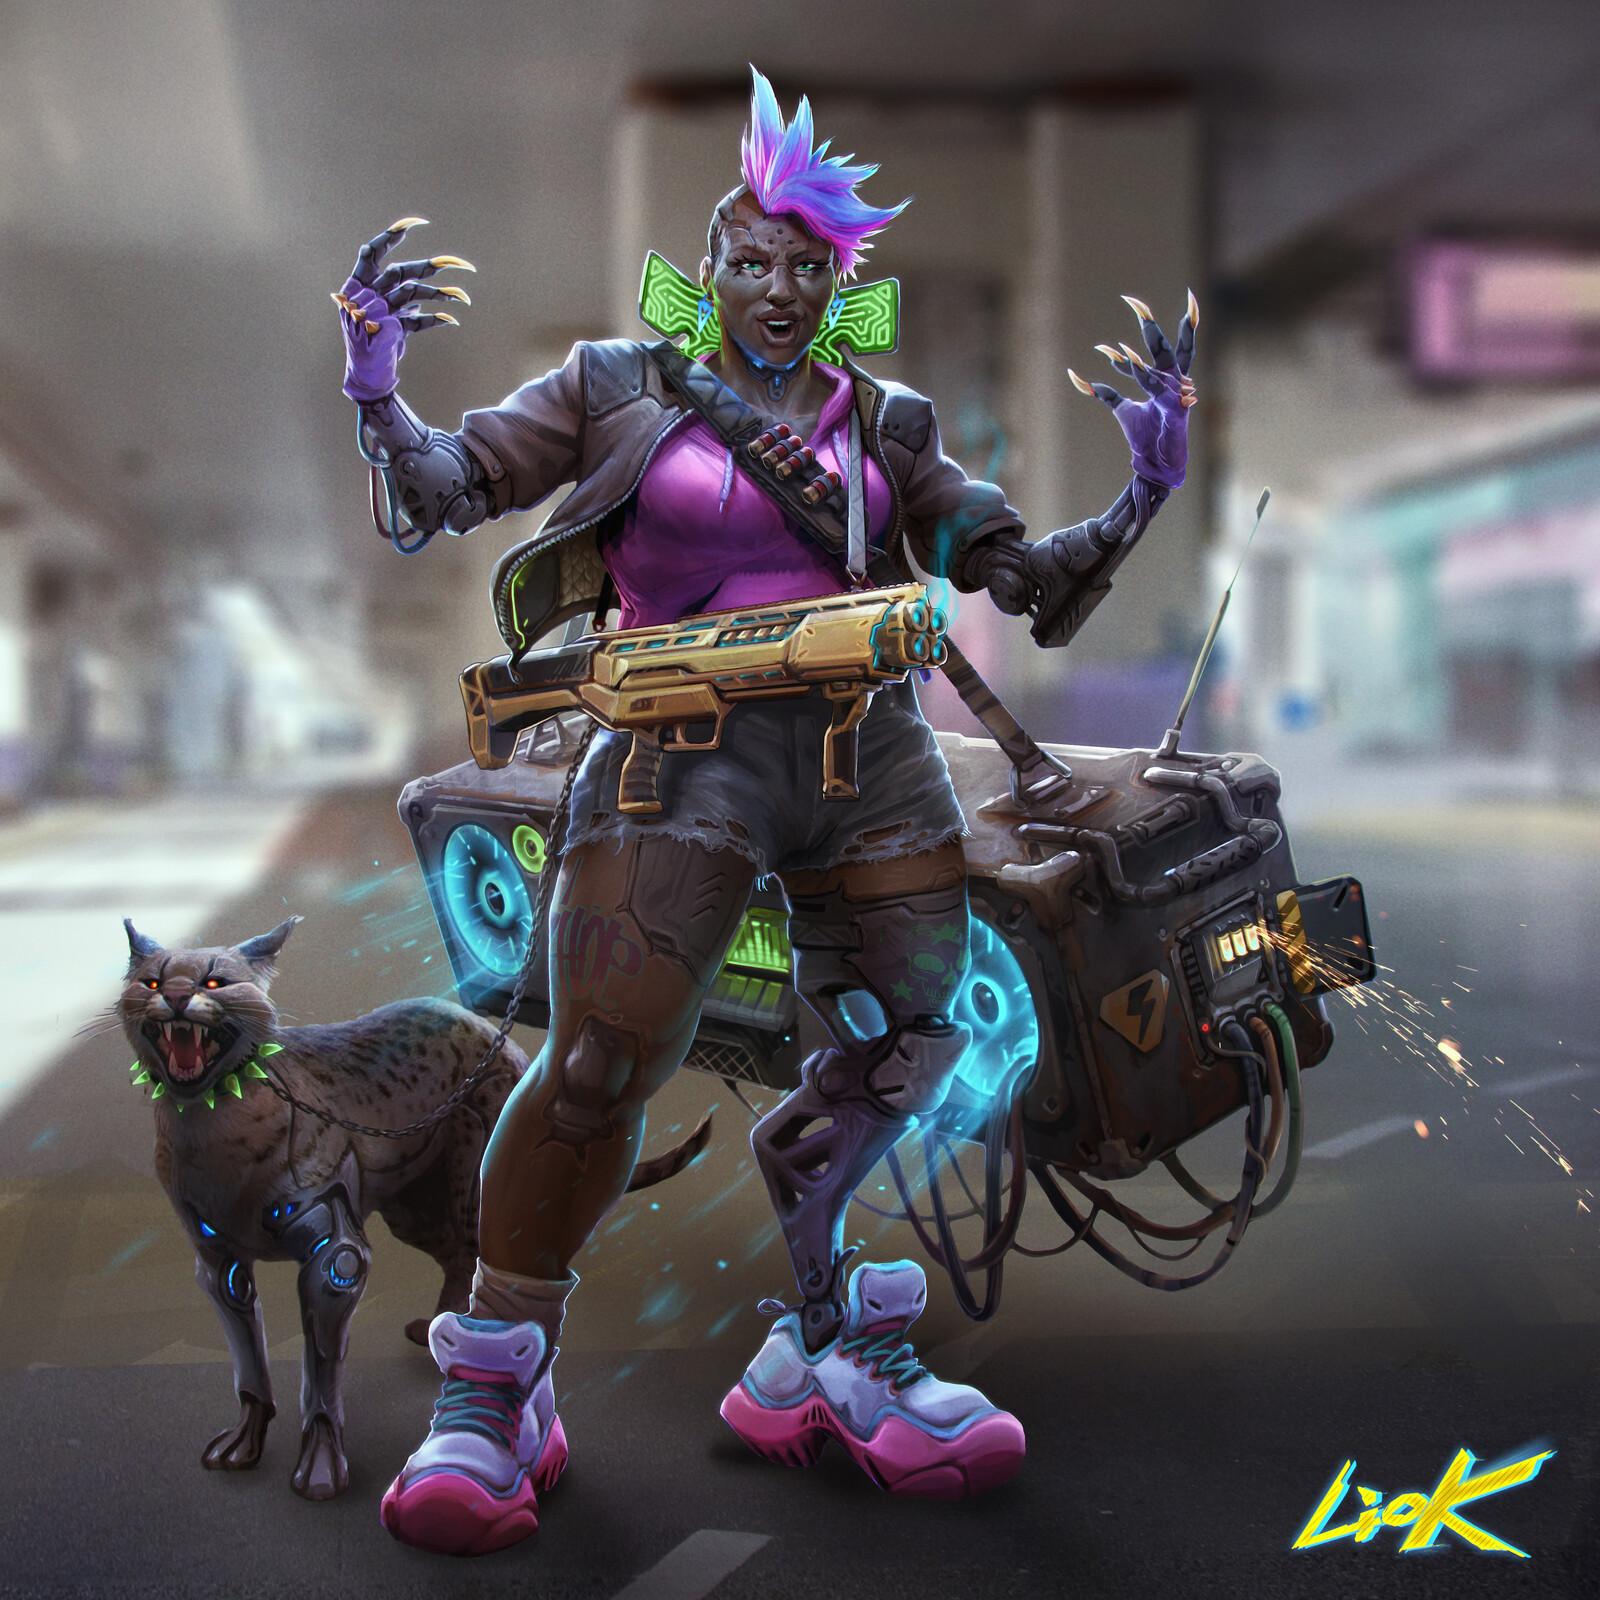 Ghetto Blaster girl, Cyberpunk 2077 challenge on digital painitng school.